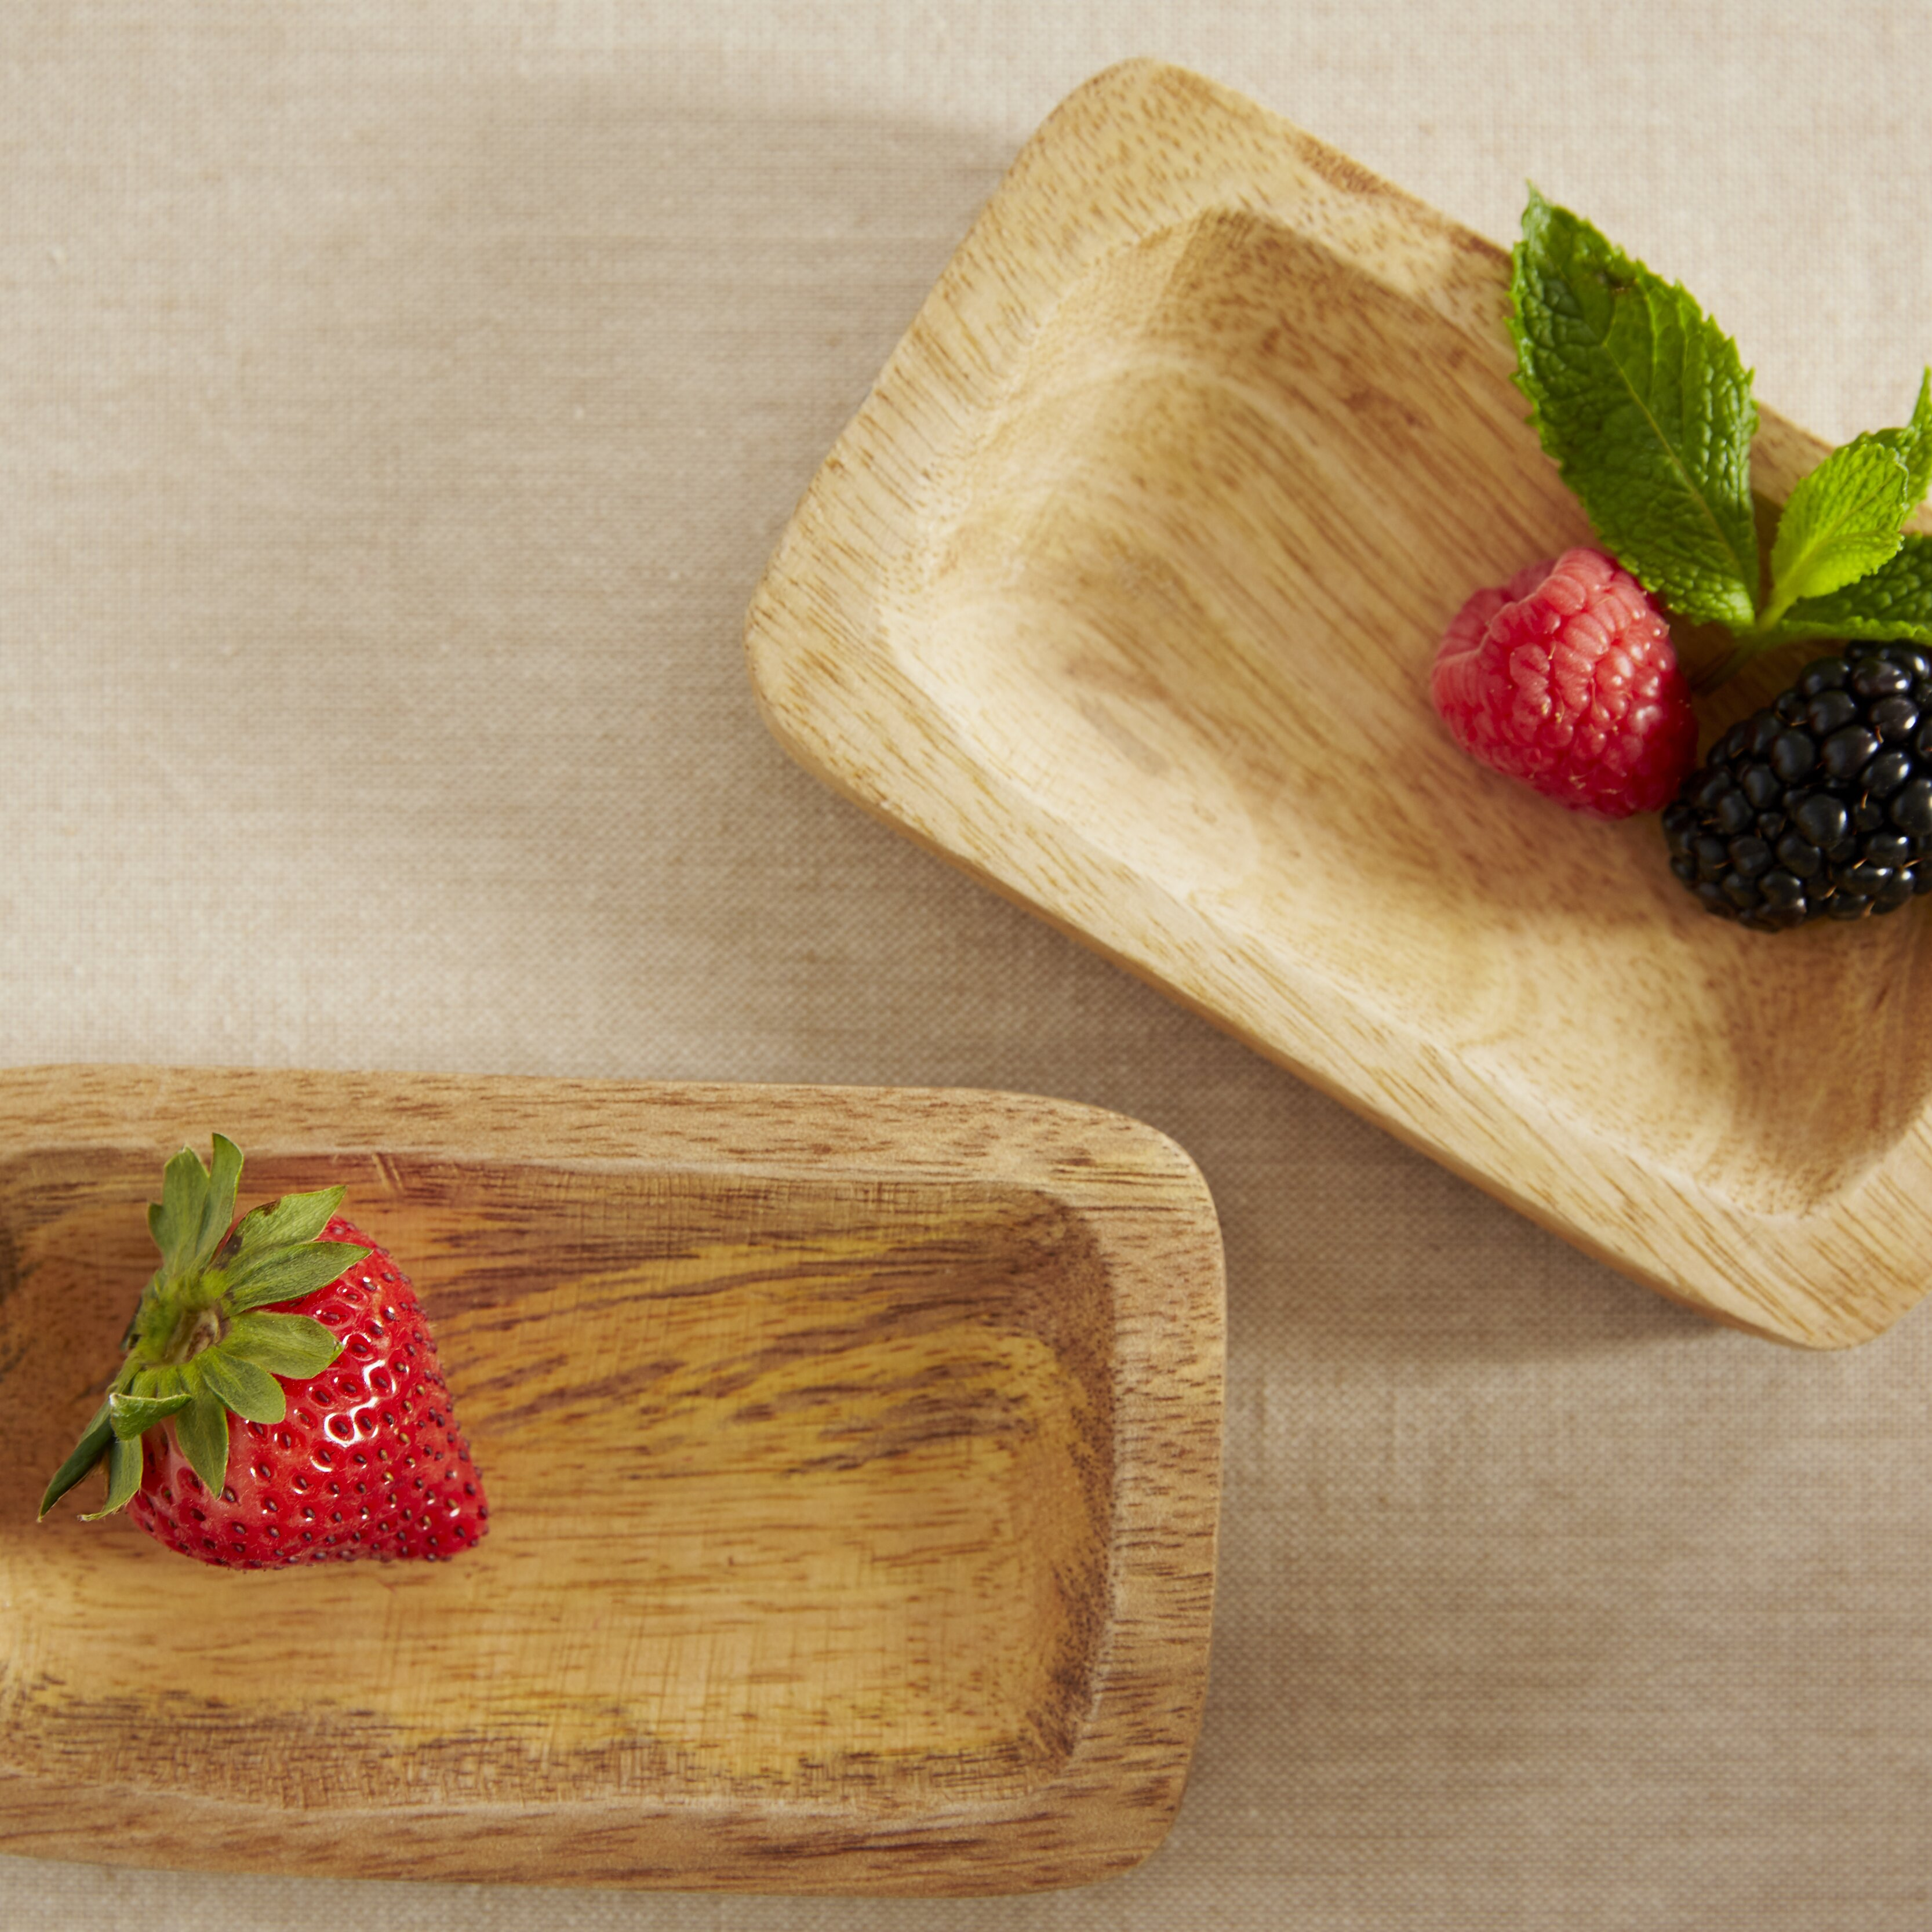 couleur nature light wood serving tray wayfair. Black Bedroom Furniture Sets. Home Design Ideas